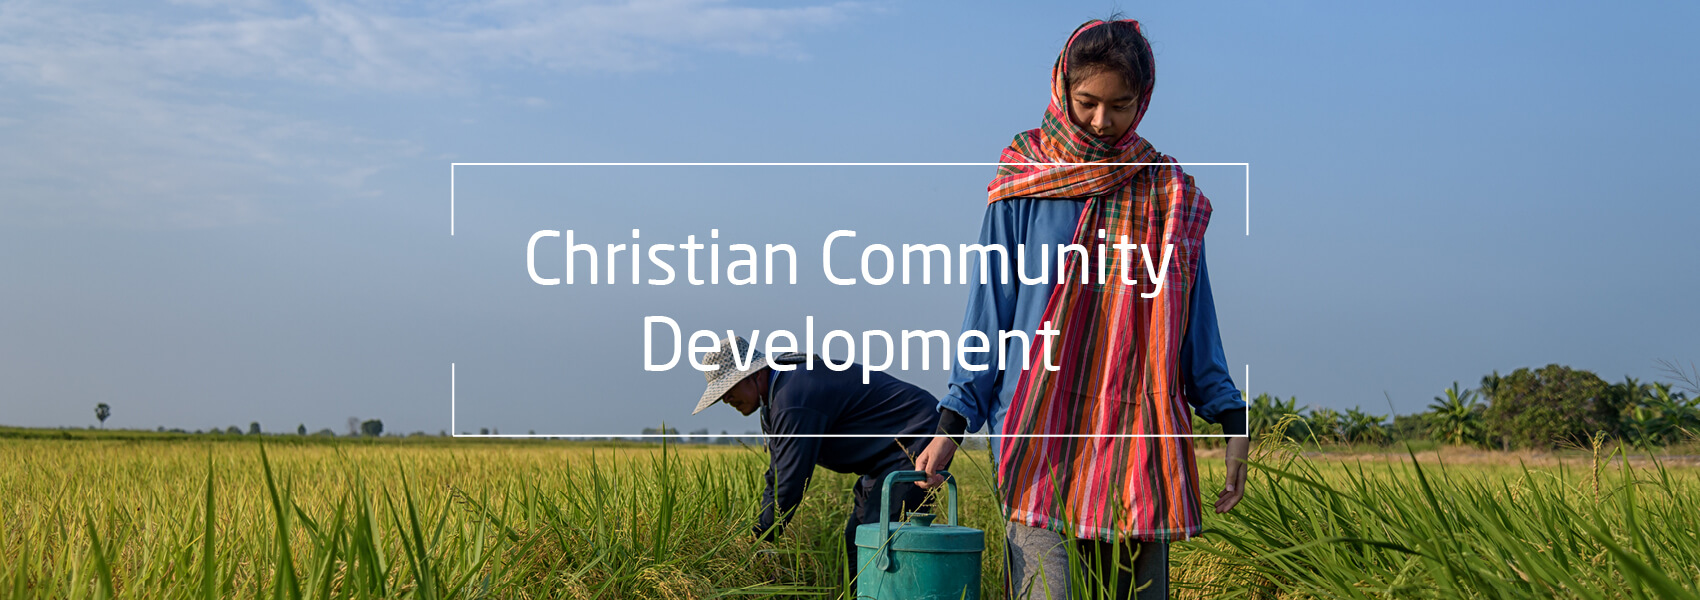 Ernte Asien, Text: Christian Community Development